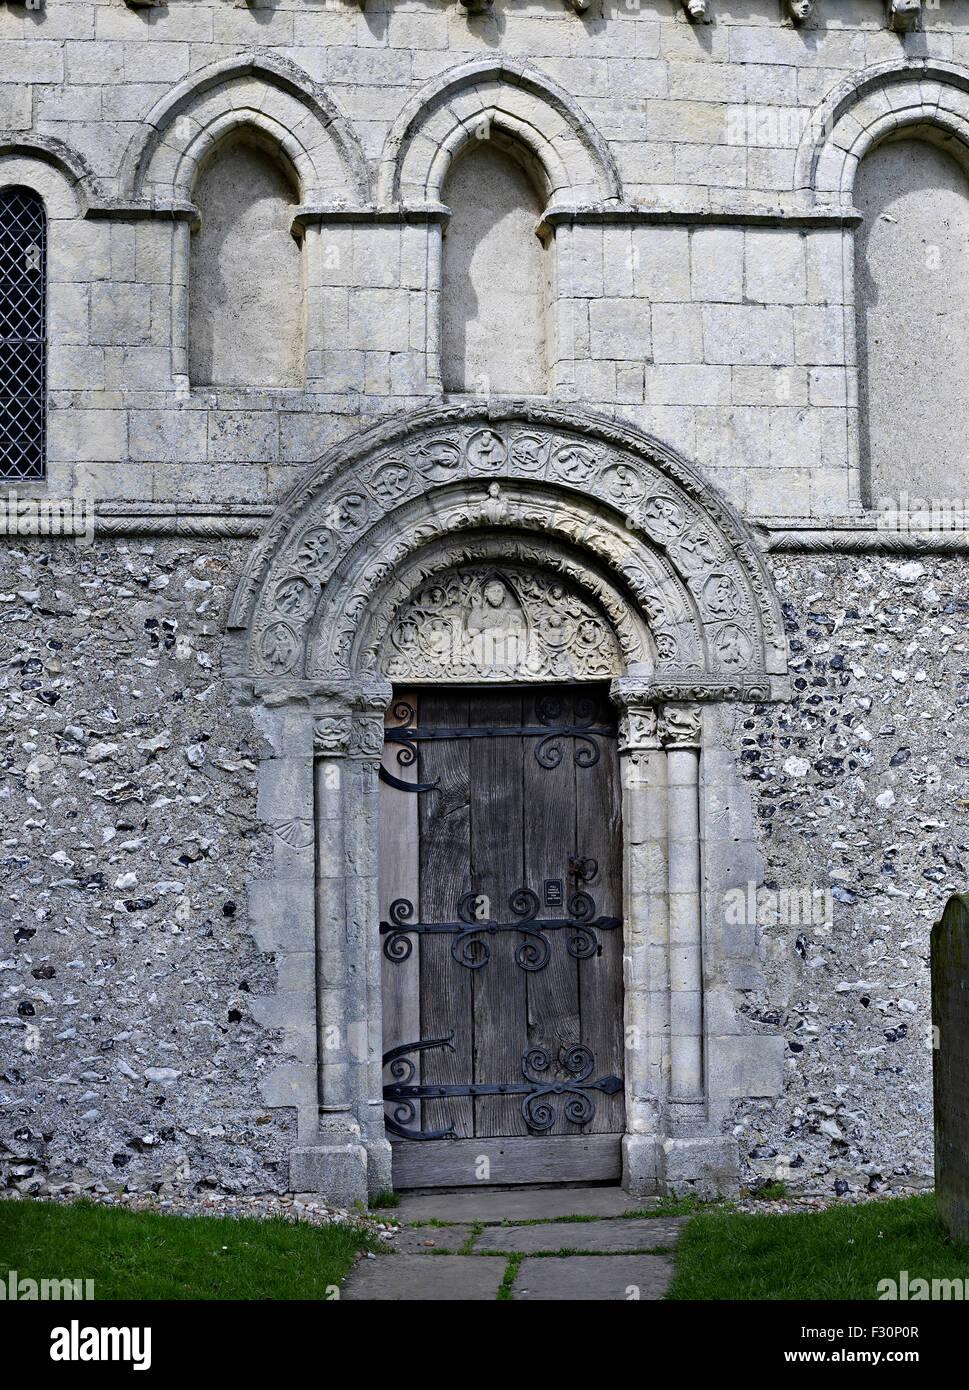 Barfrestone, St Nicholas, Kent. Norman doorway - Stock Image